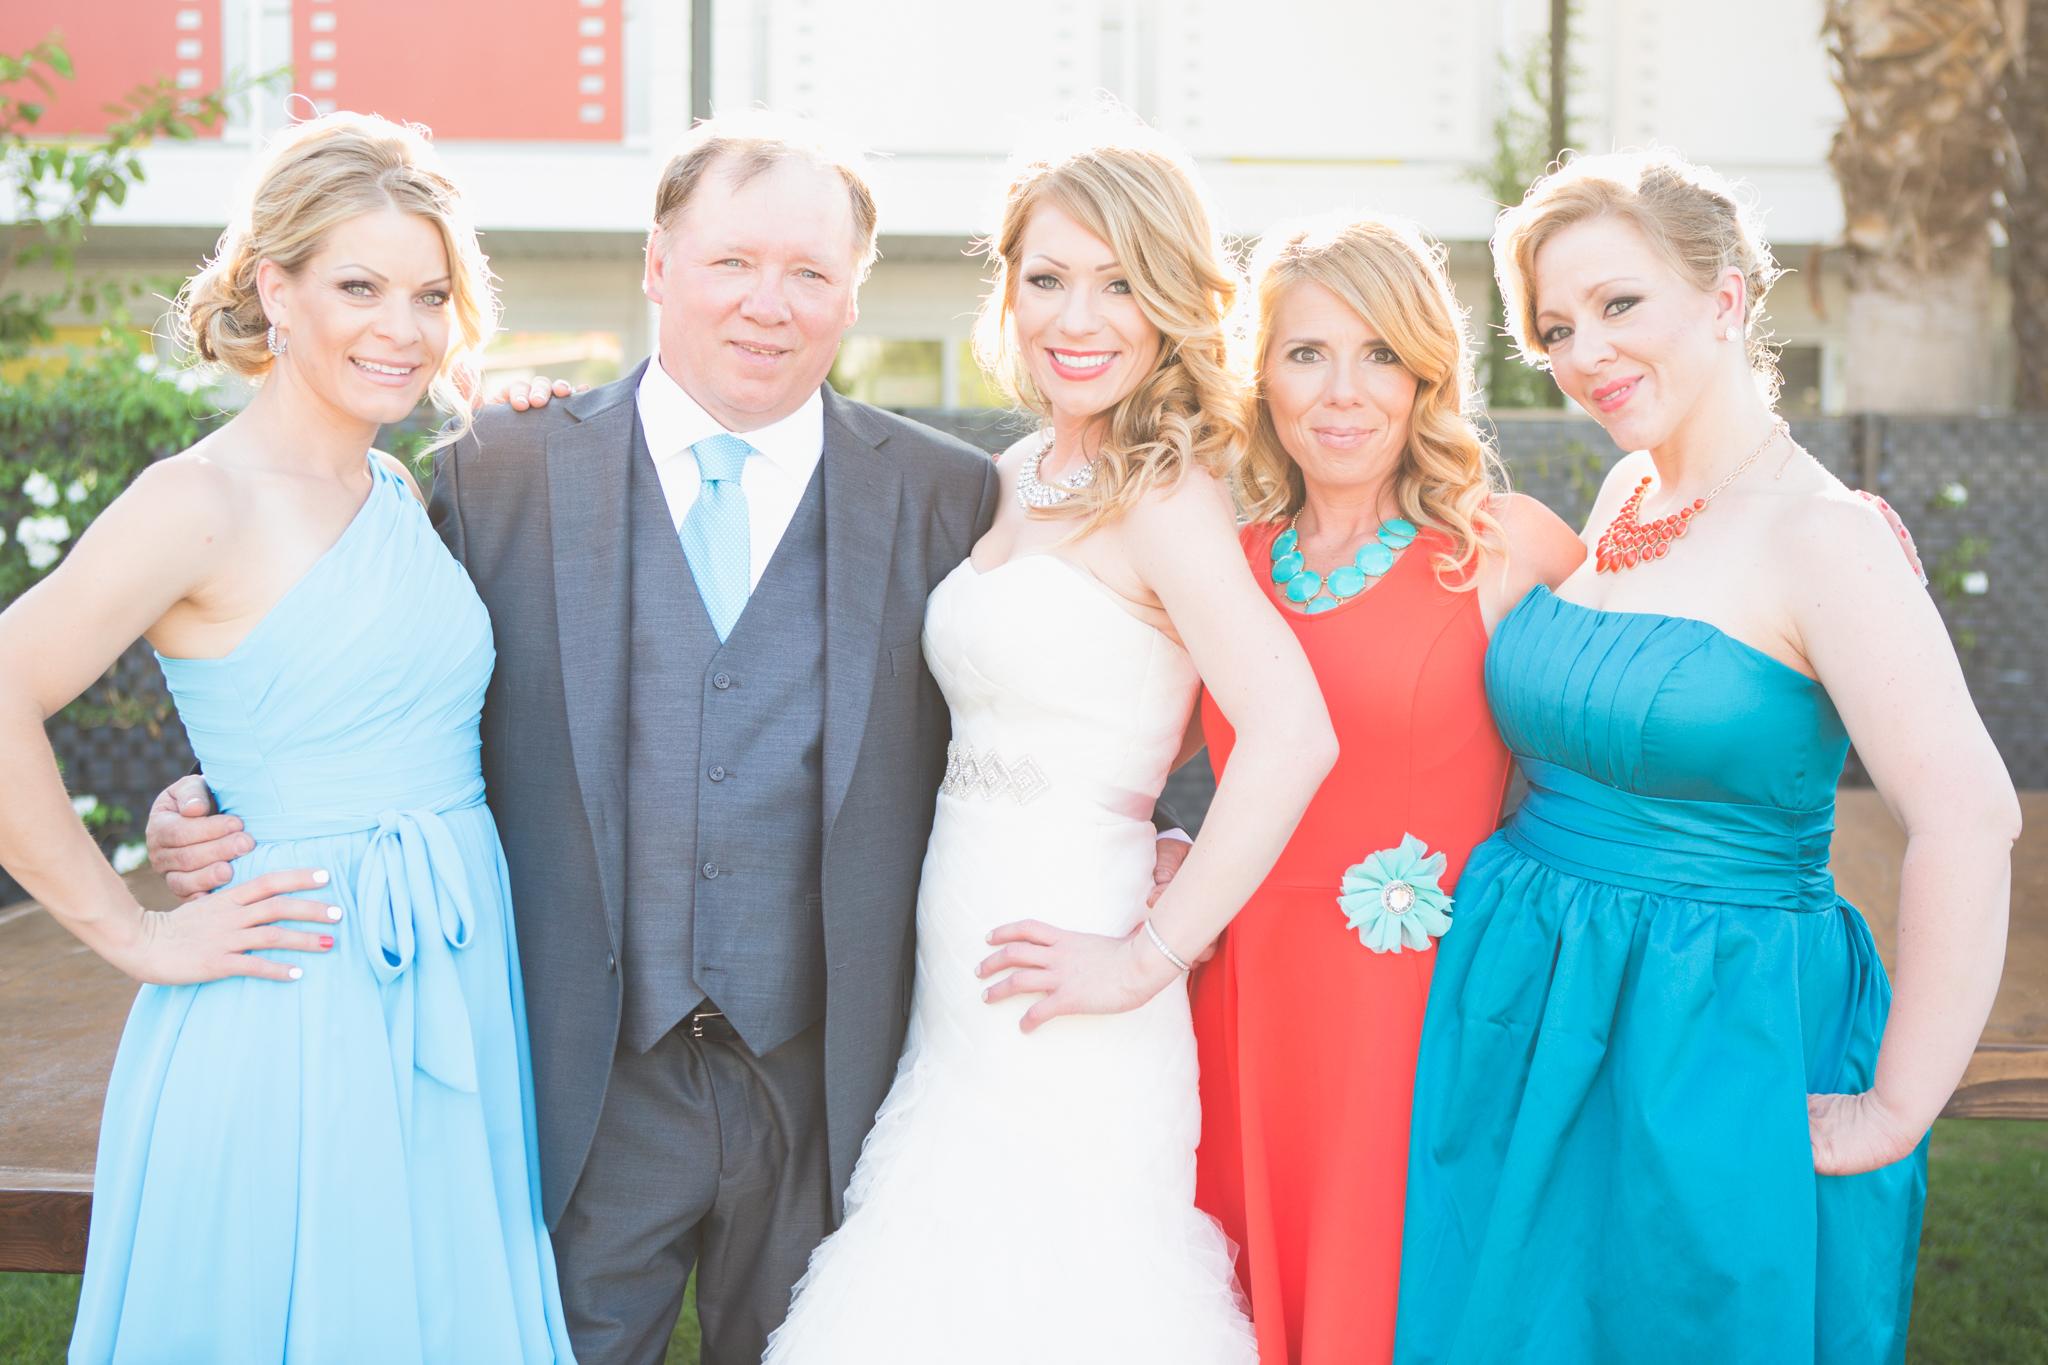 scottsdale-wedding-photographer-el-dorado-bride-sisters-father-colorful-backlight